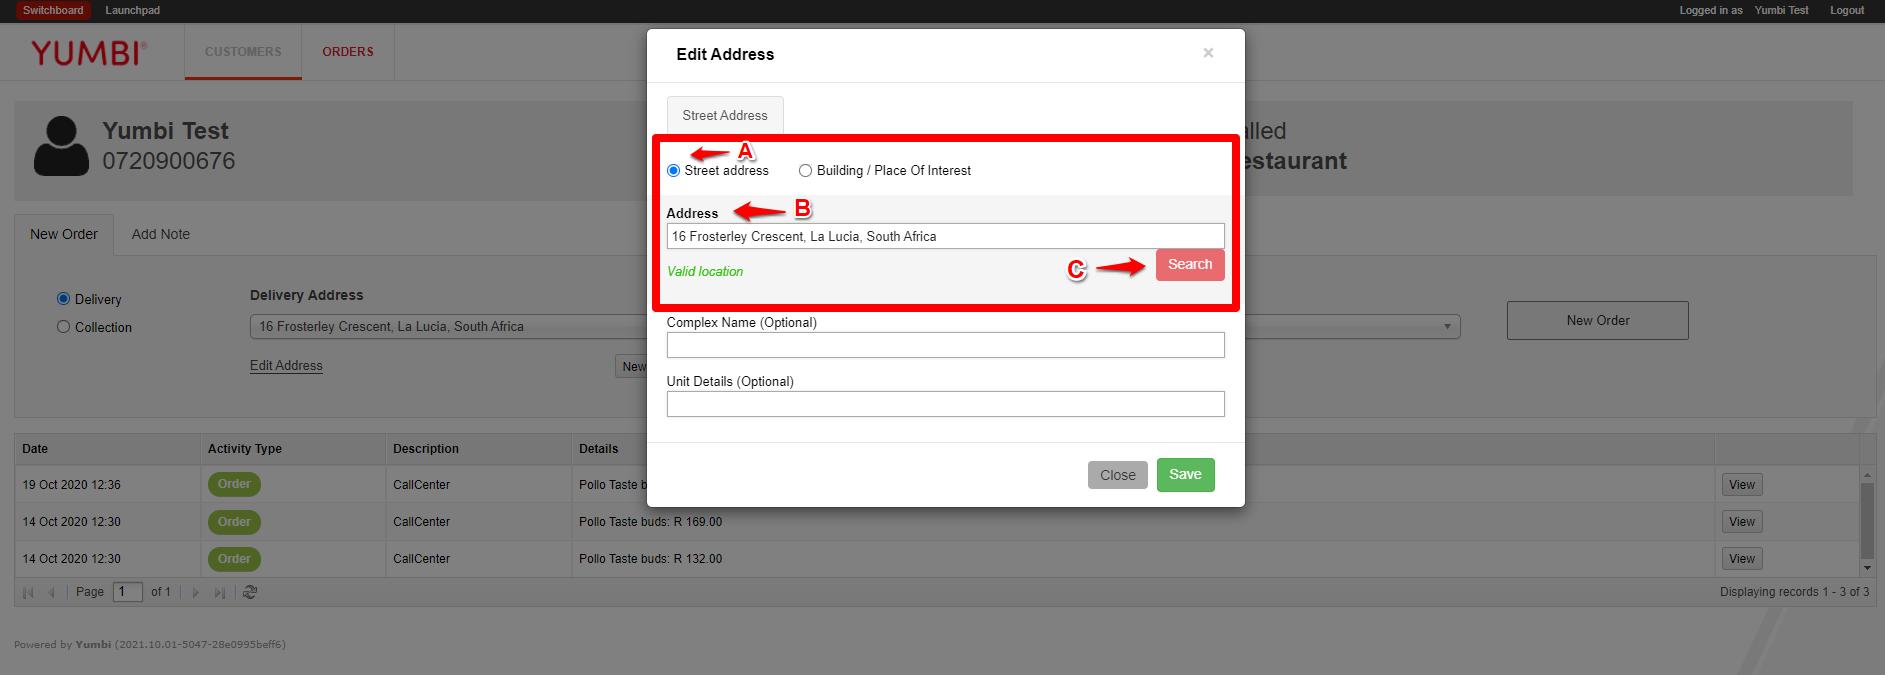 Edit Address Modal.png